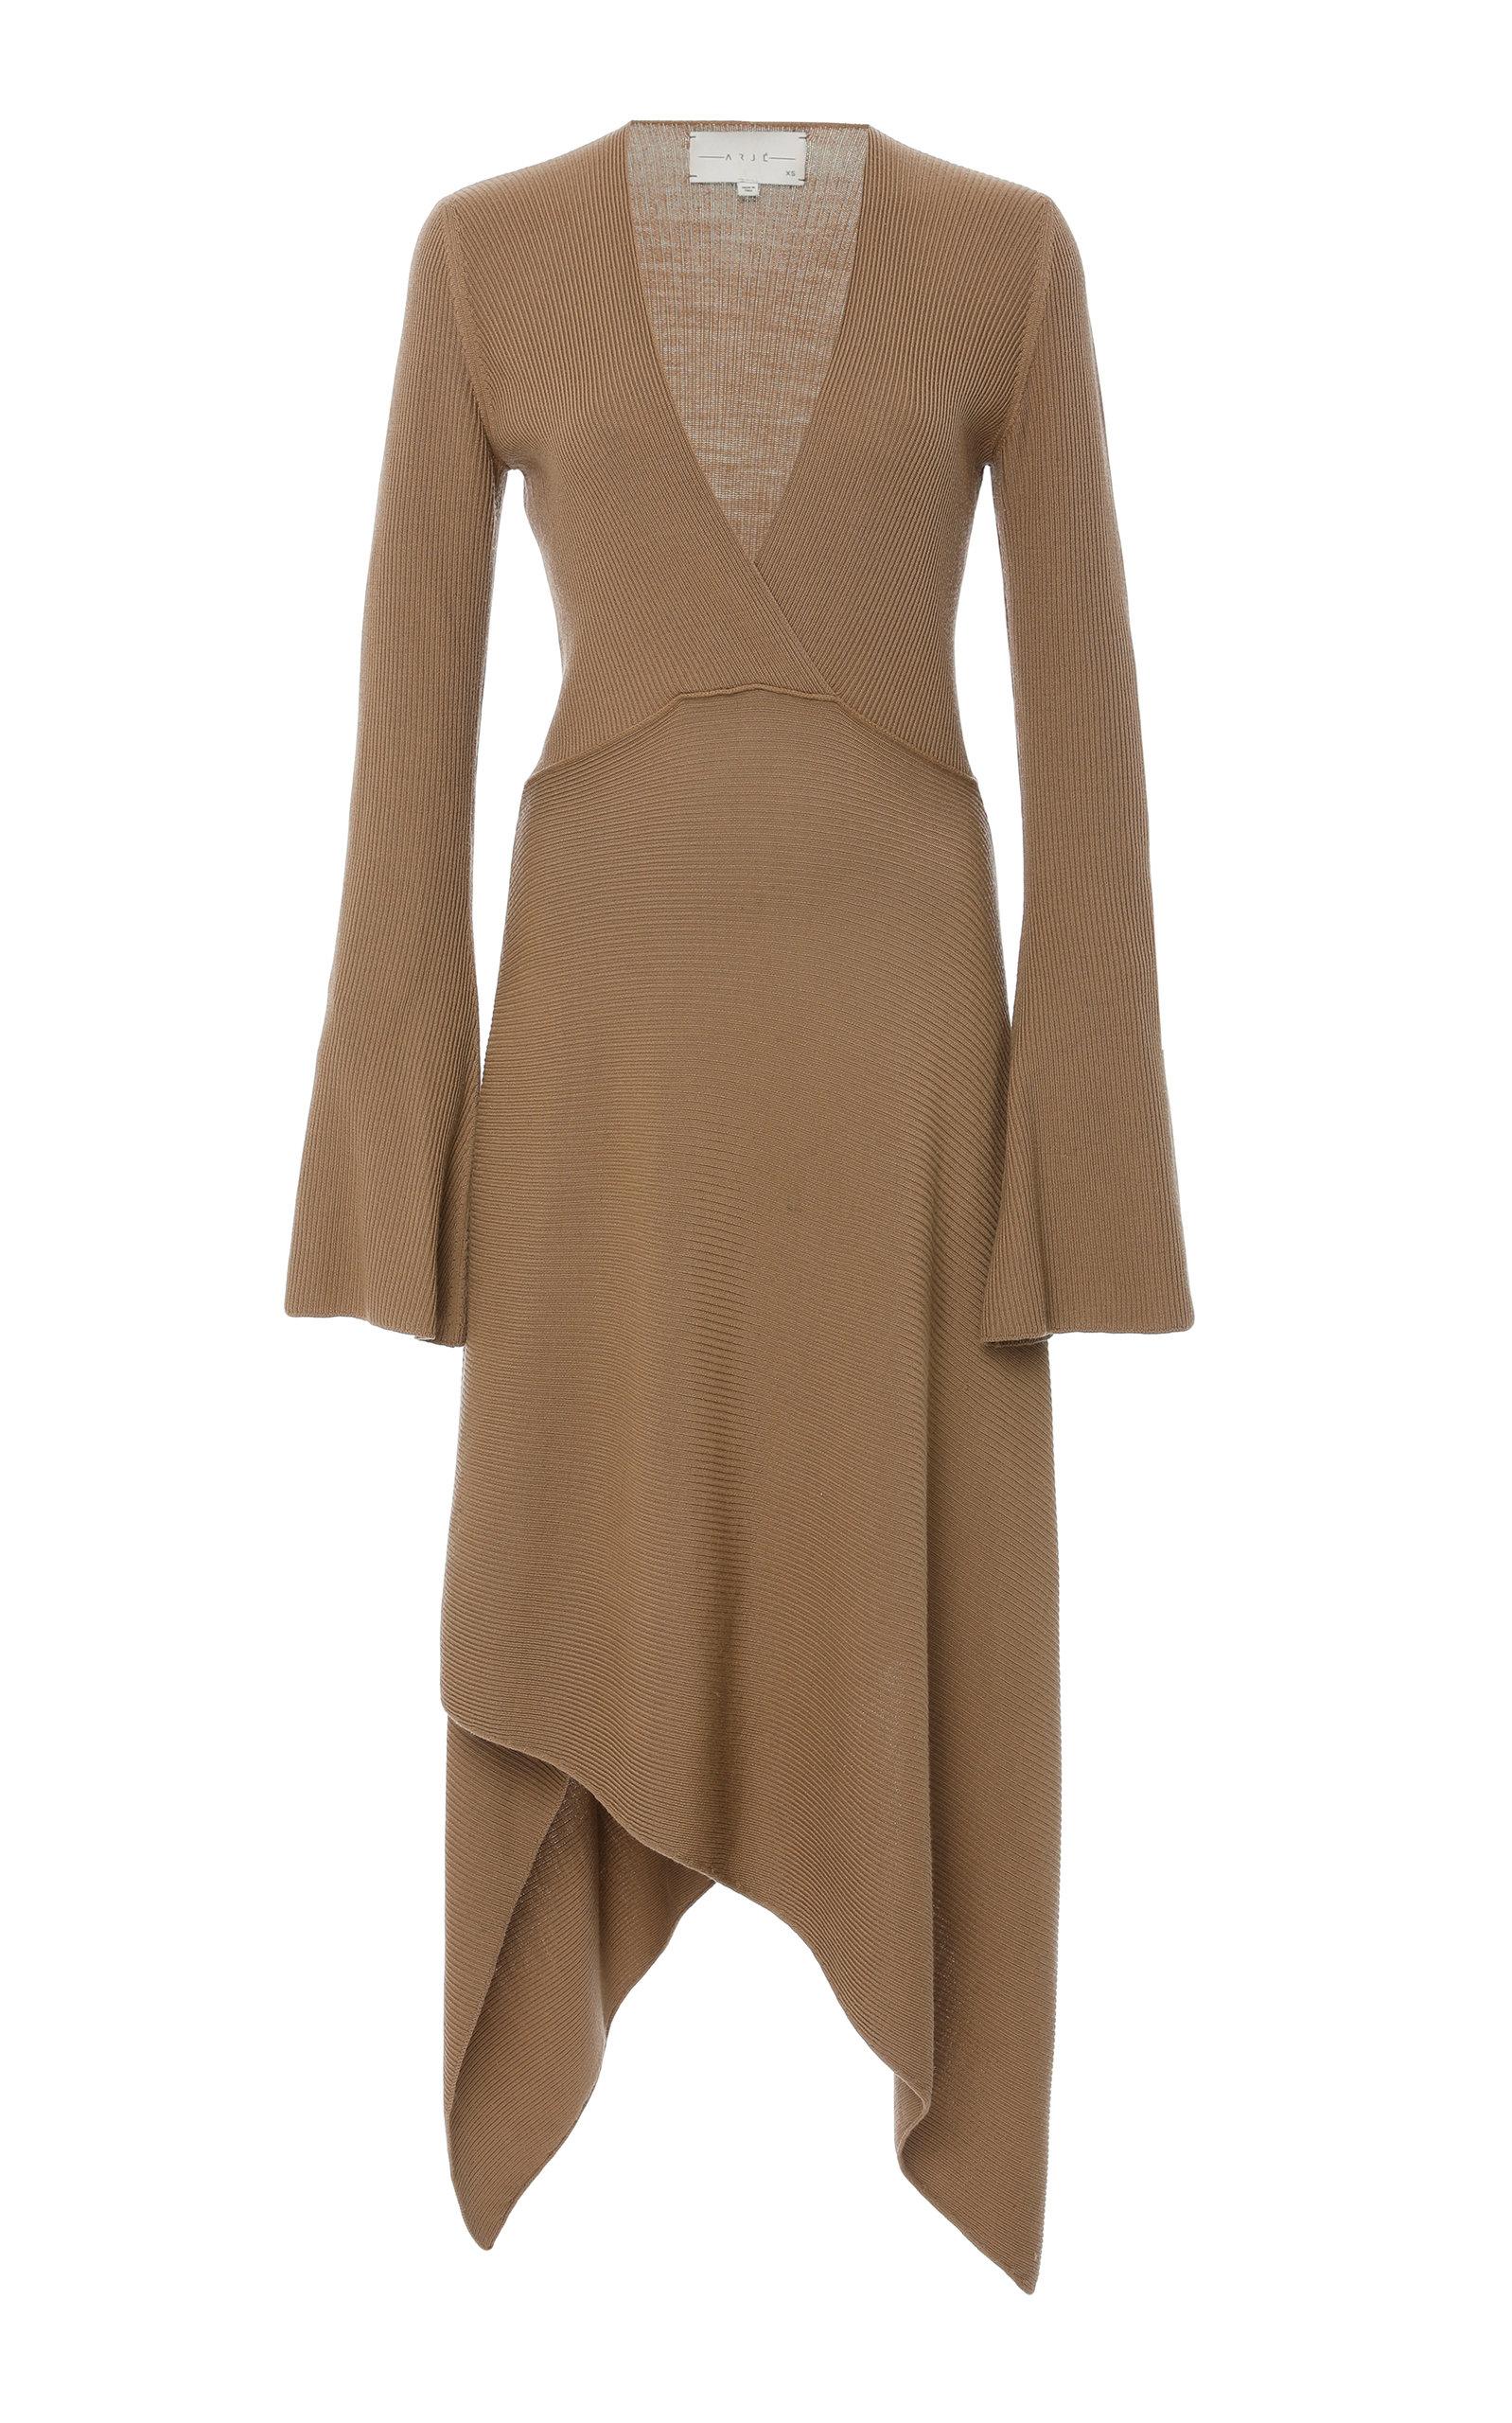 ARJE St Moritz Wool V Neck Dress in Brown